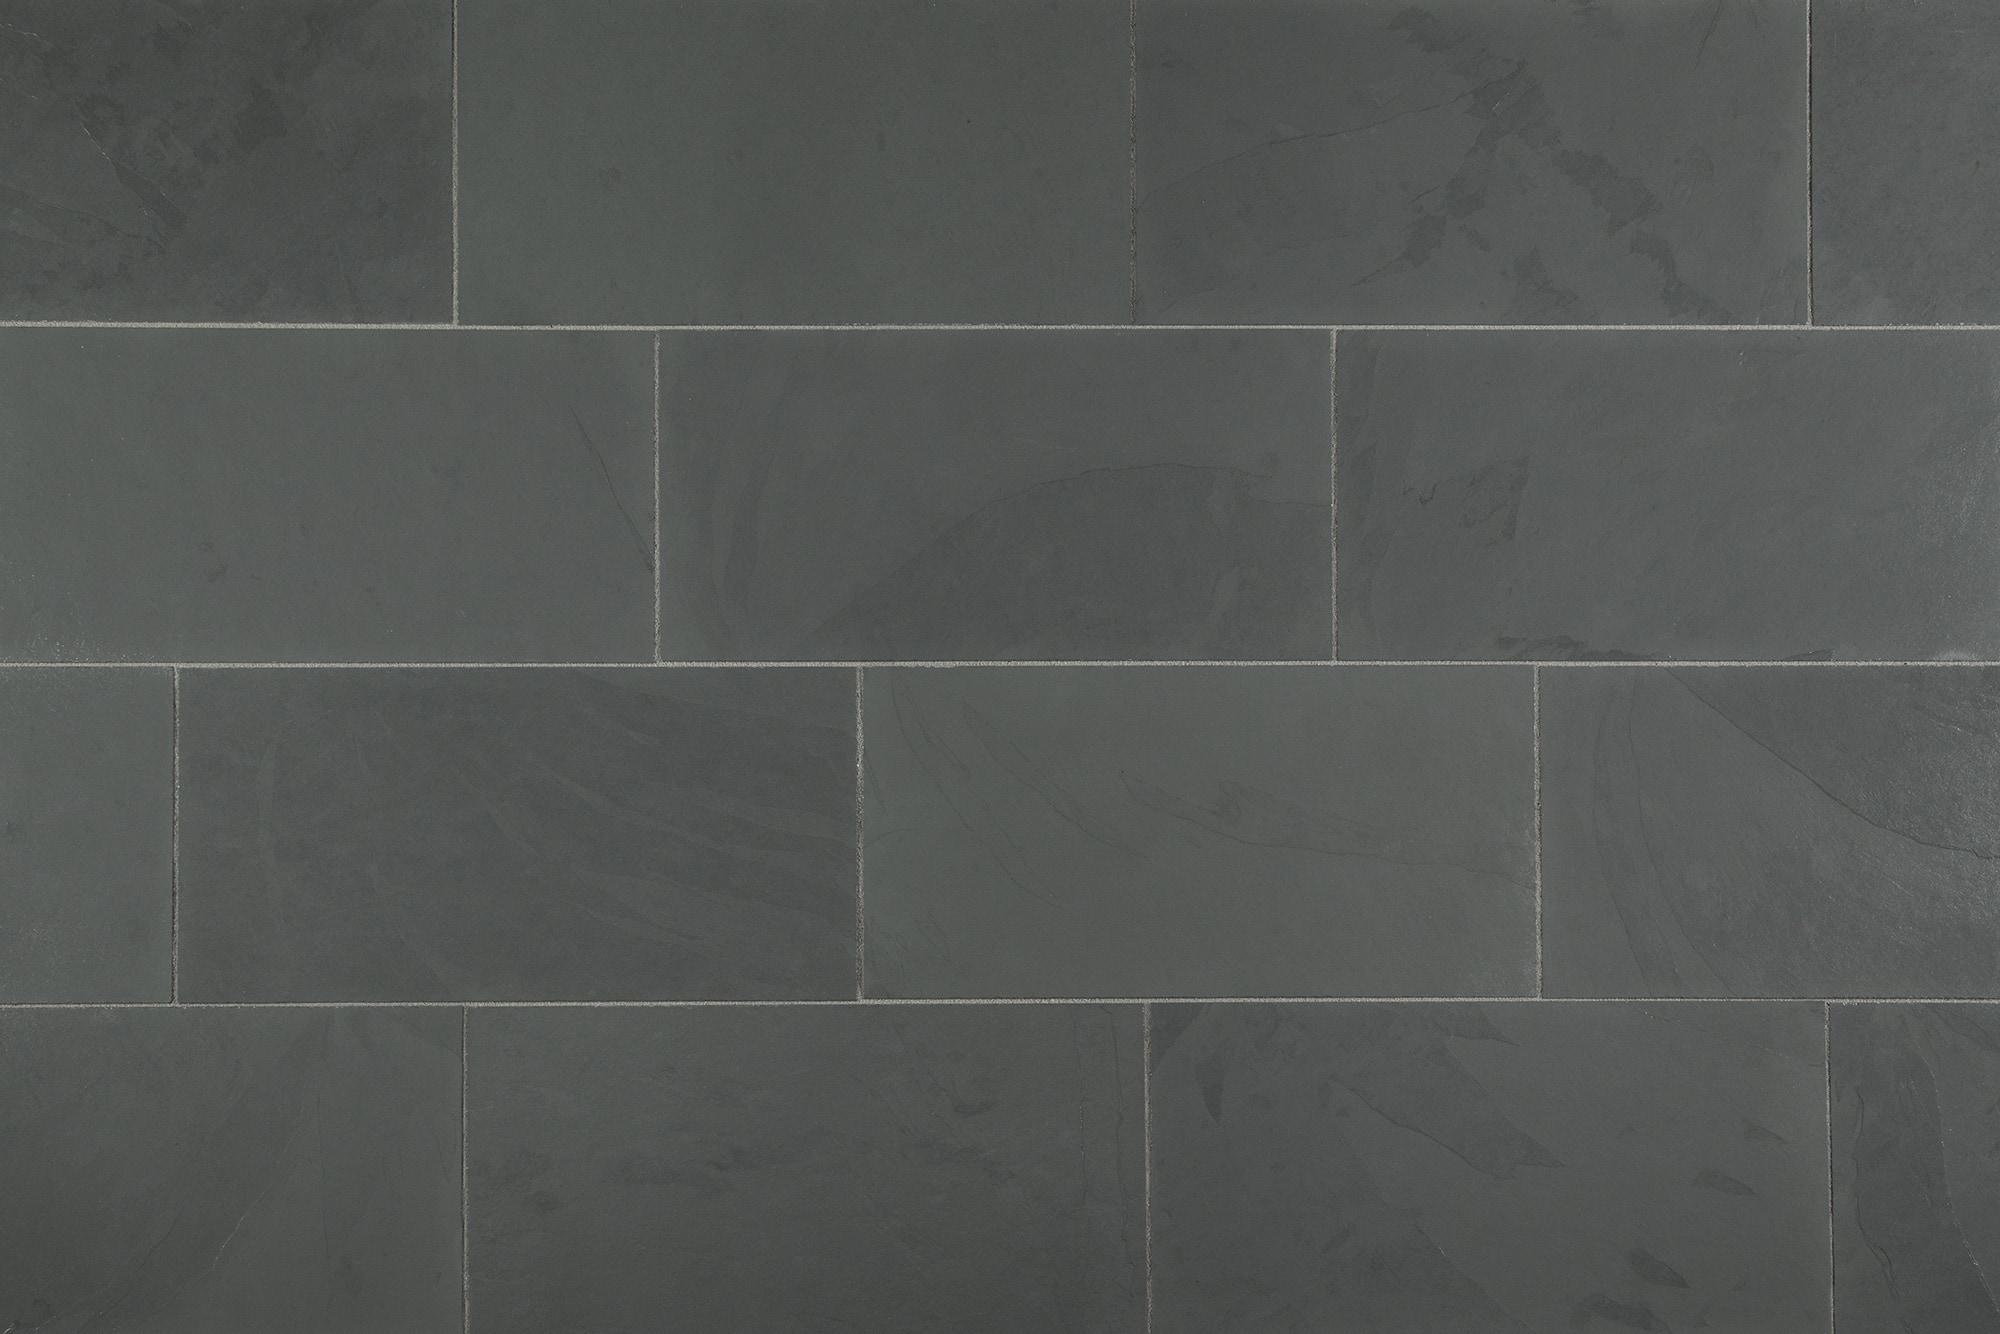 Janeiro slate tile montauk blue 12x24 natural dailygadgetfo Gallery